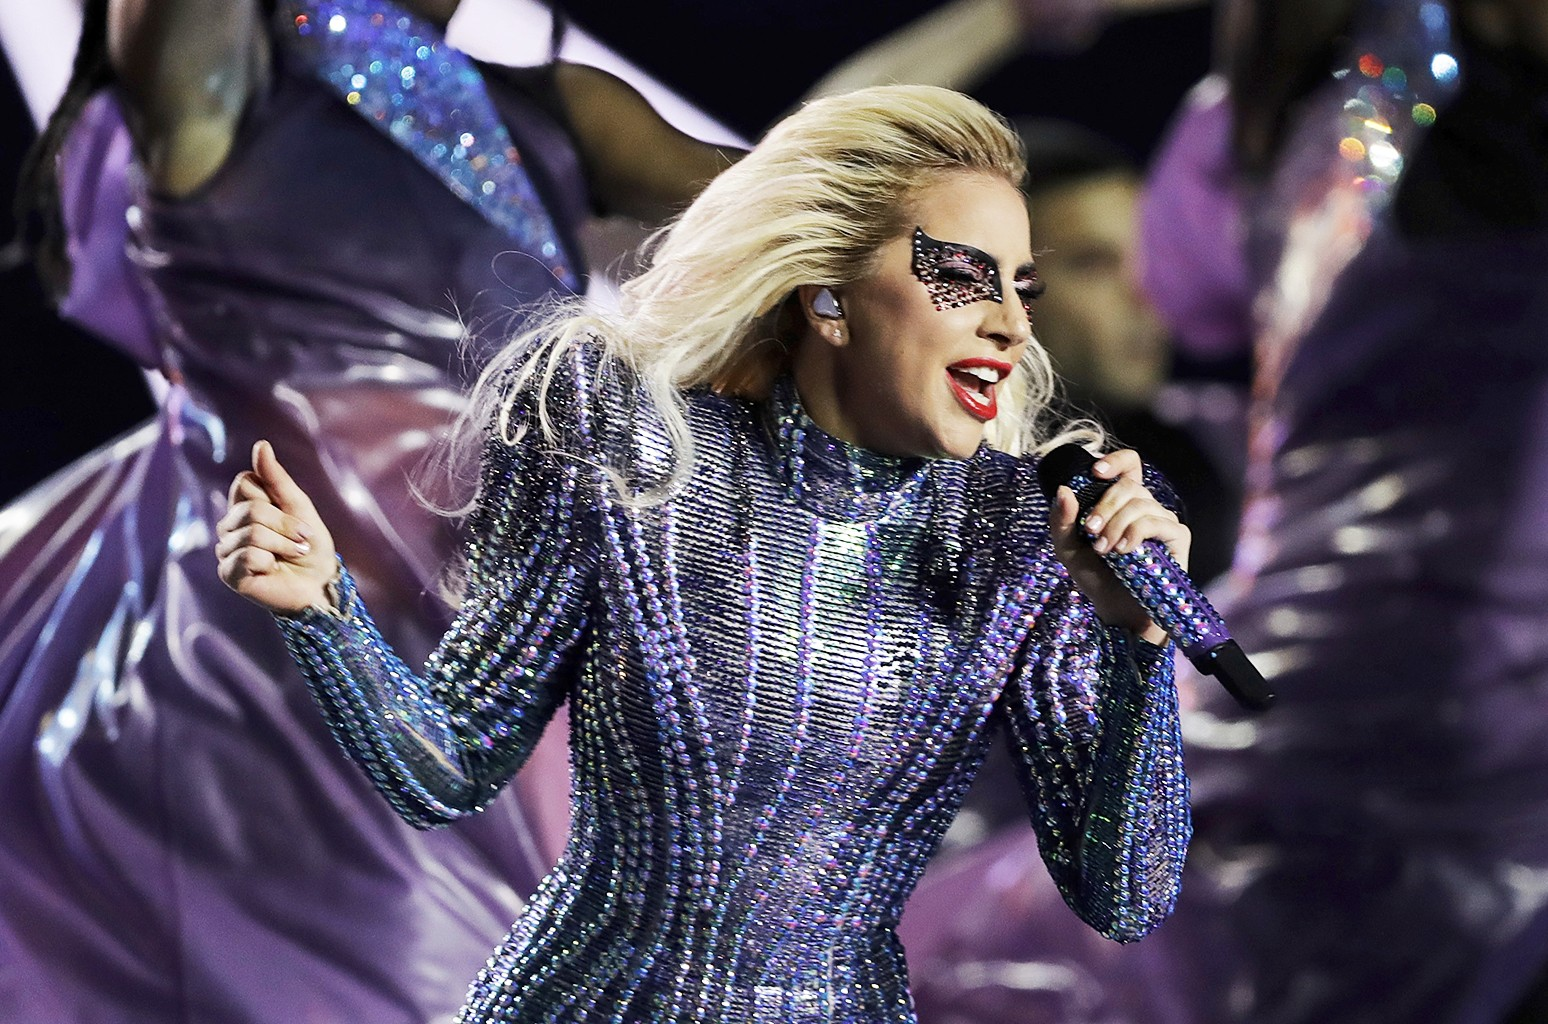 Lady Gaga performs onstage during the Pepsi Zero Sugar Super Bowl LI Halftime Show at NRG Stadium on Feb. 5, 2017 in Houston.